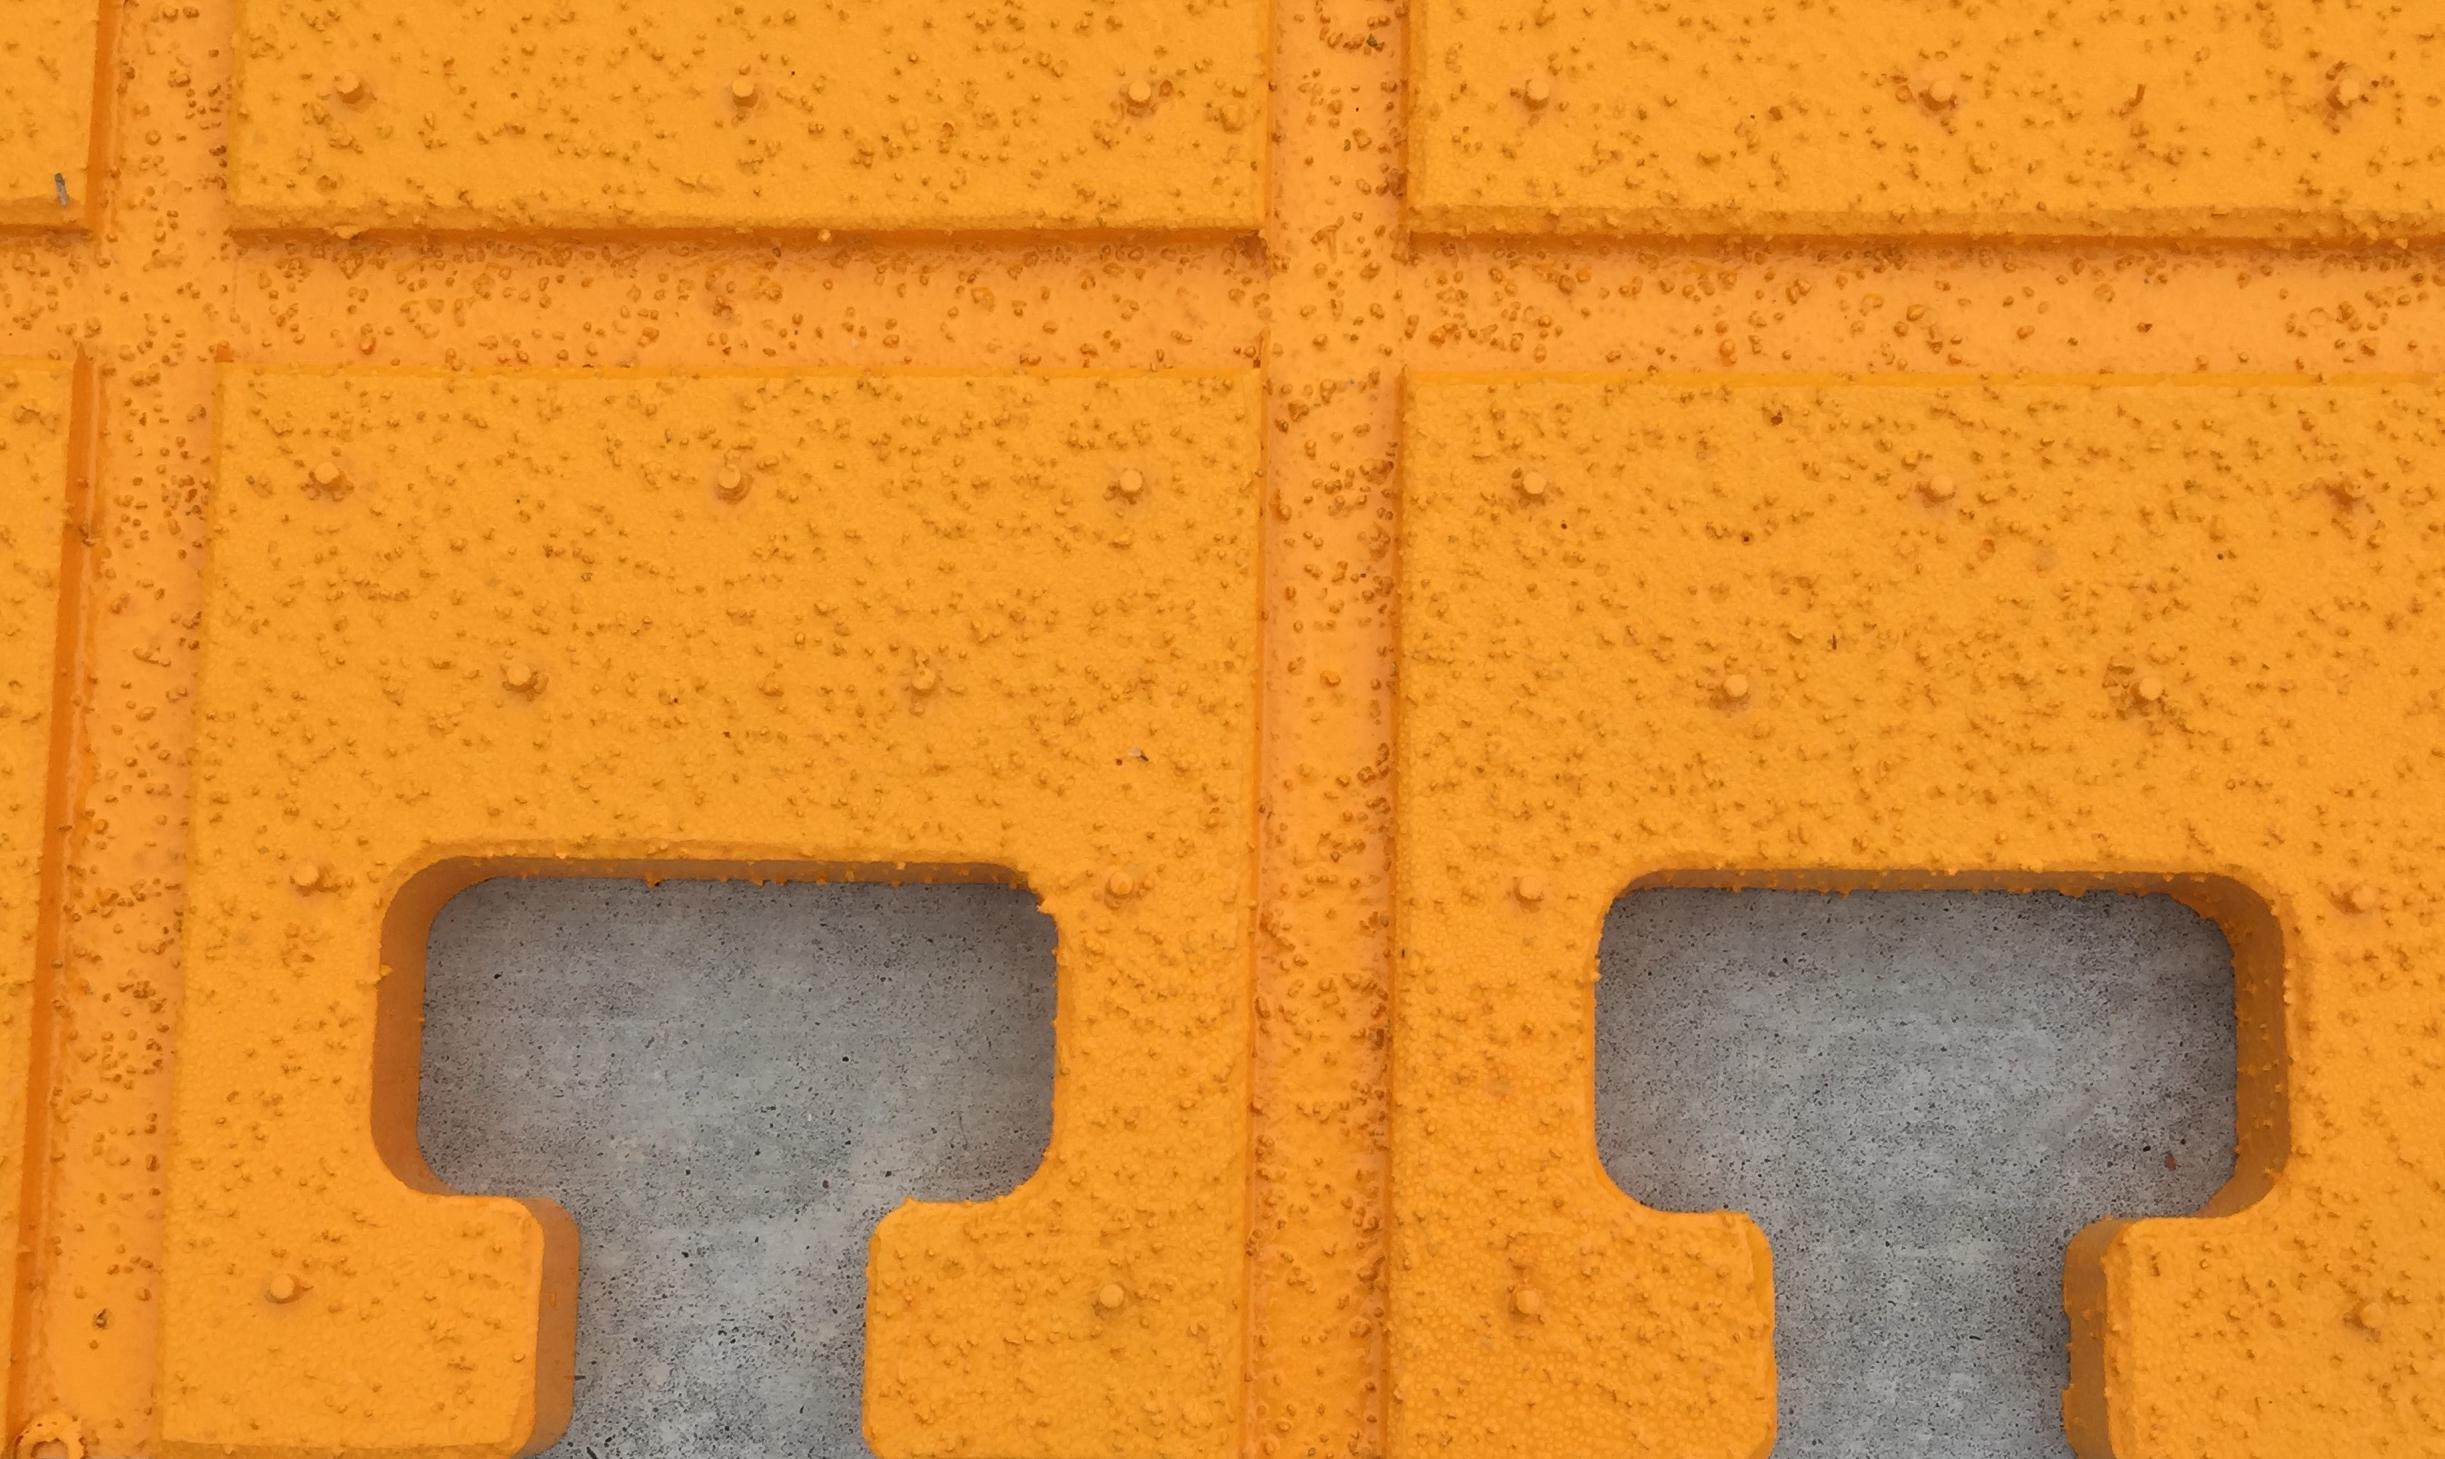 Puzzle Cut